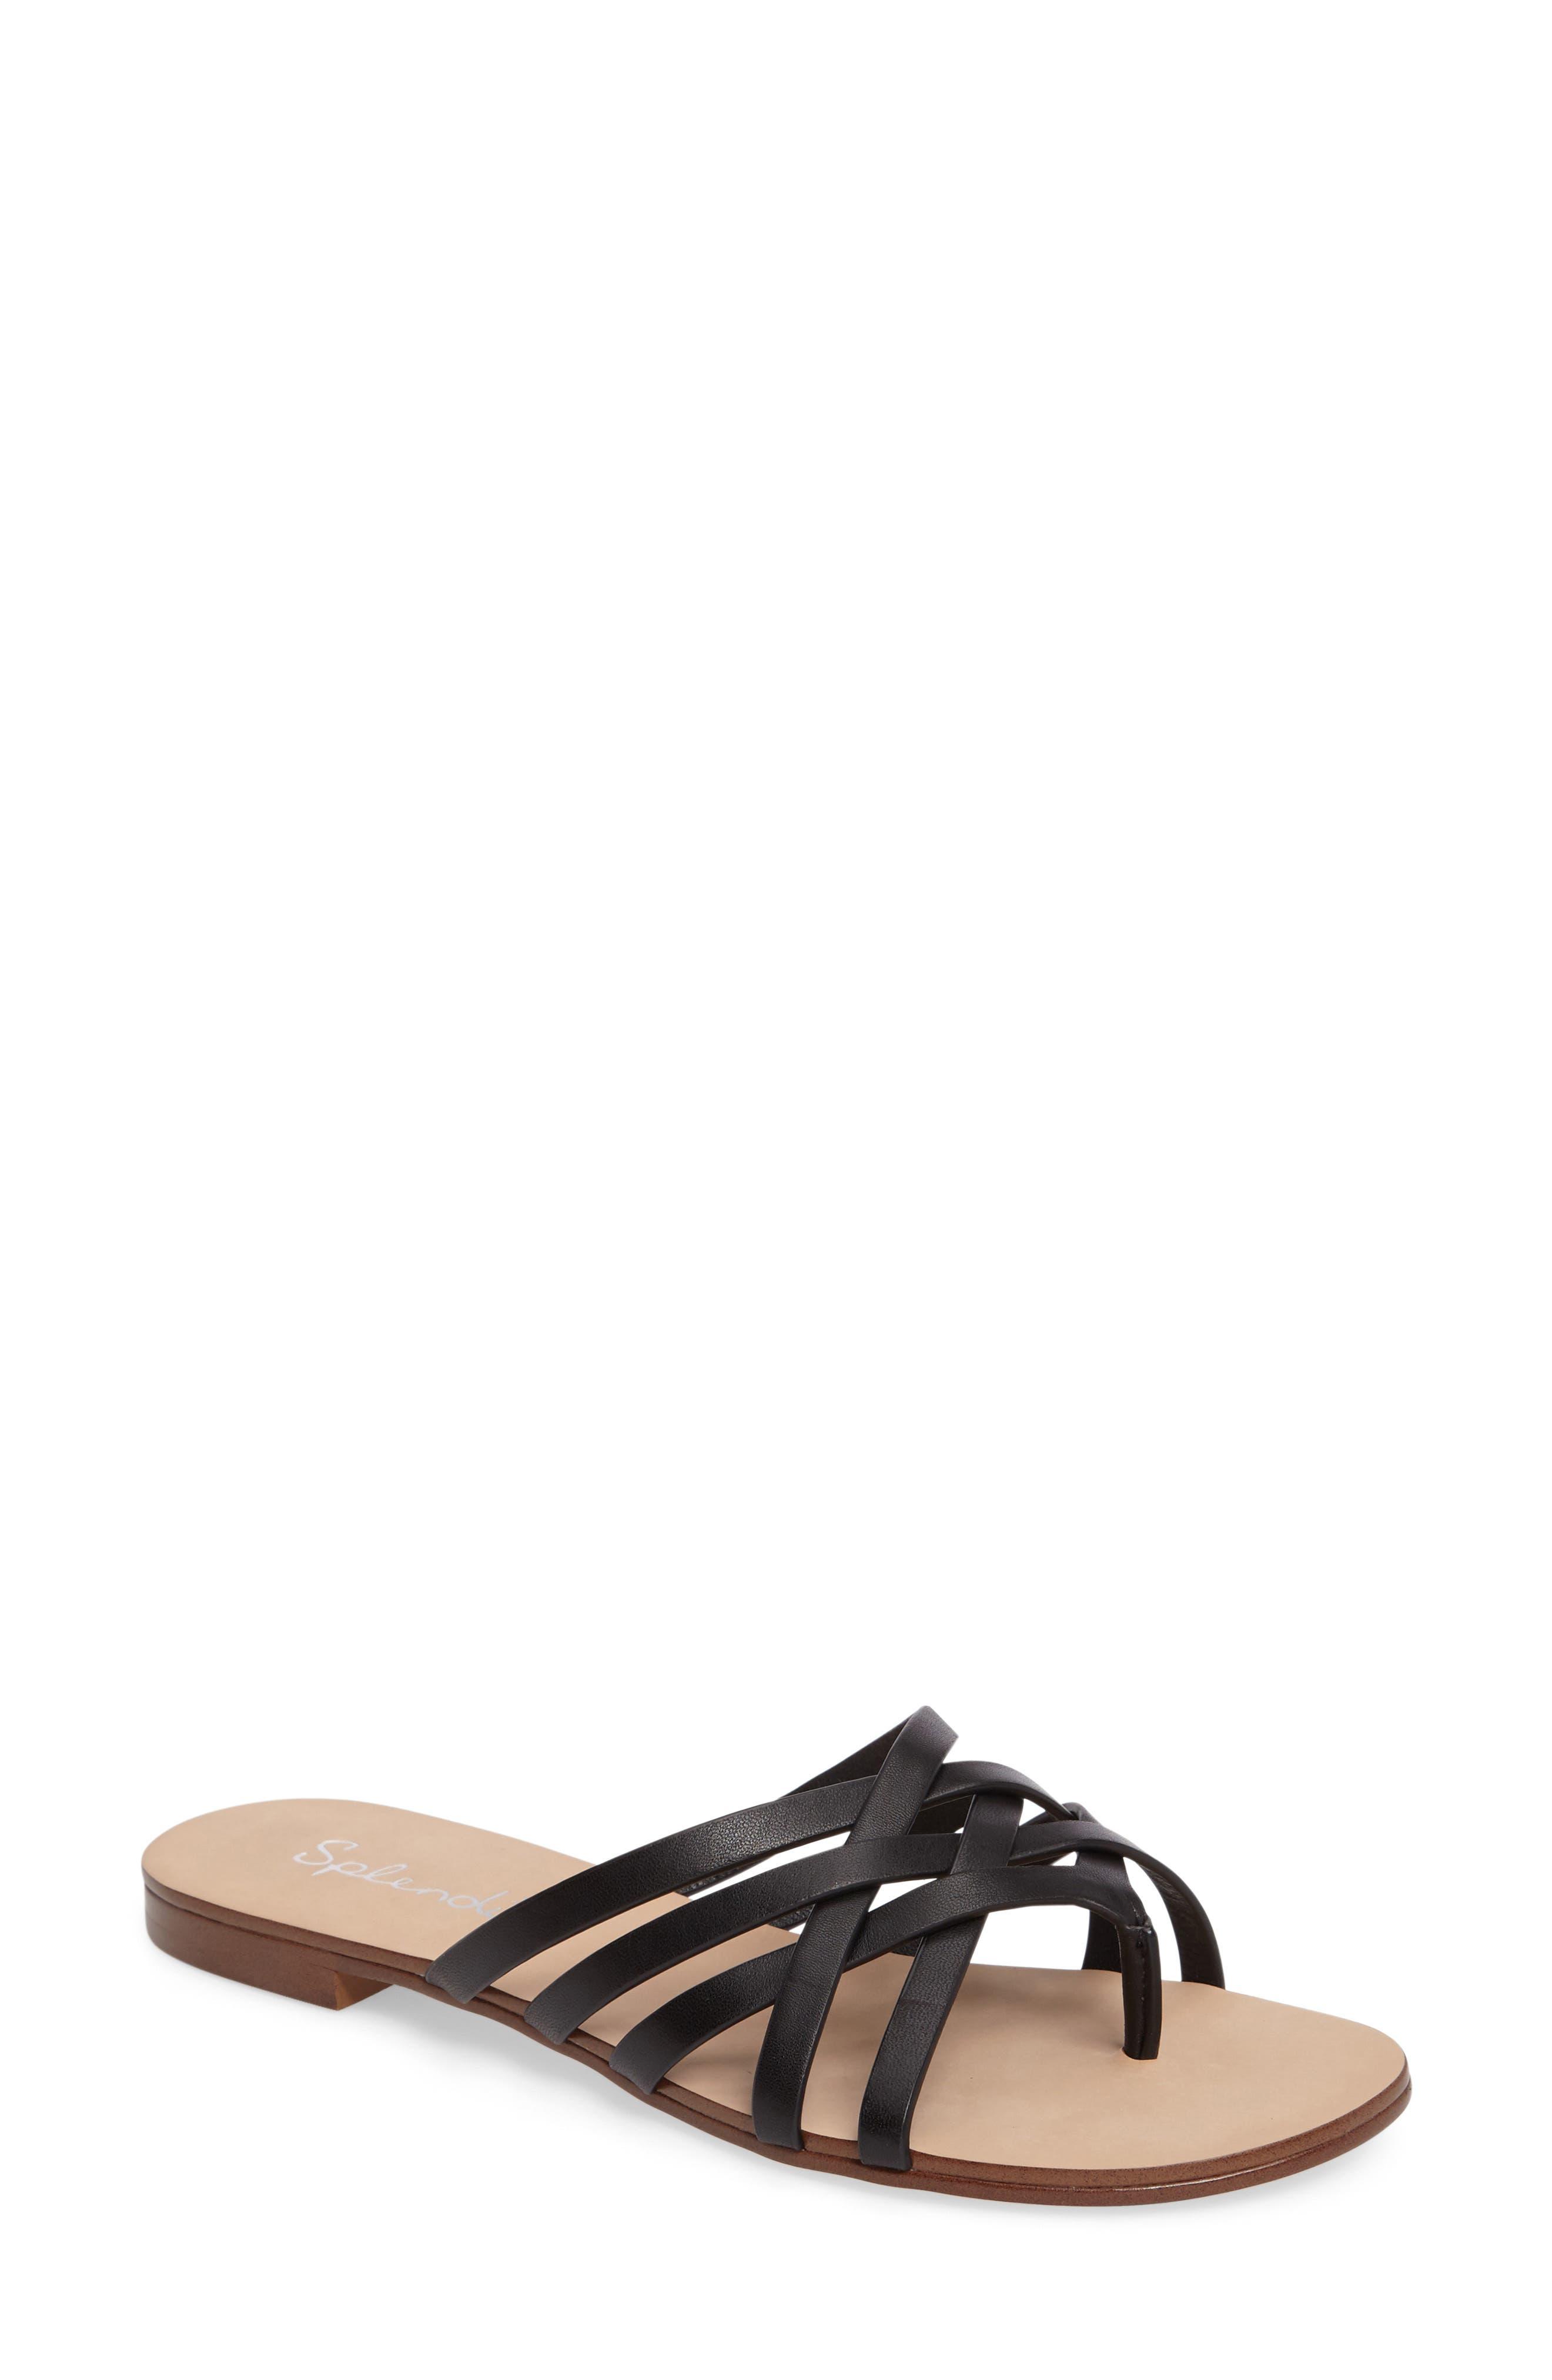 Jojo Slide Sandal,                         Main,                         color, Black Leather